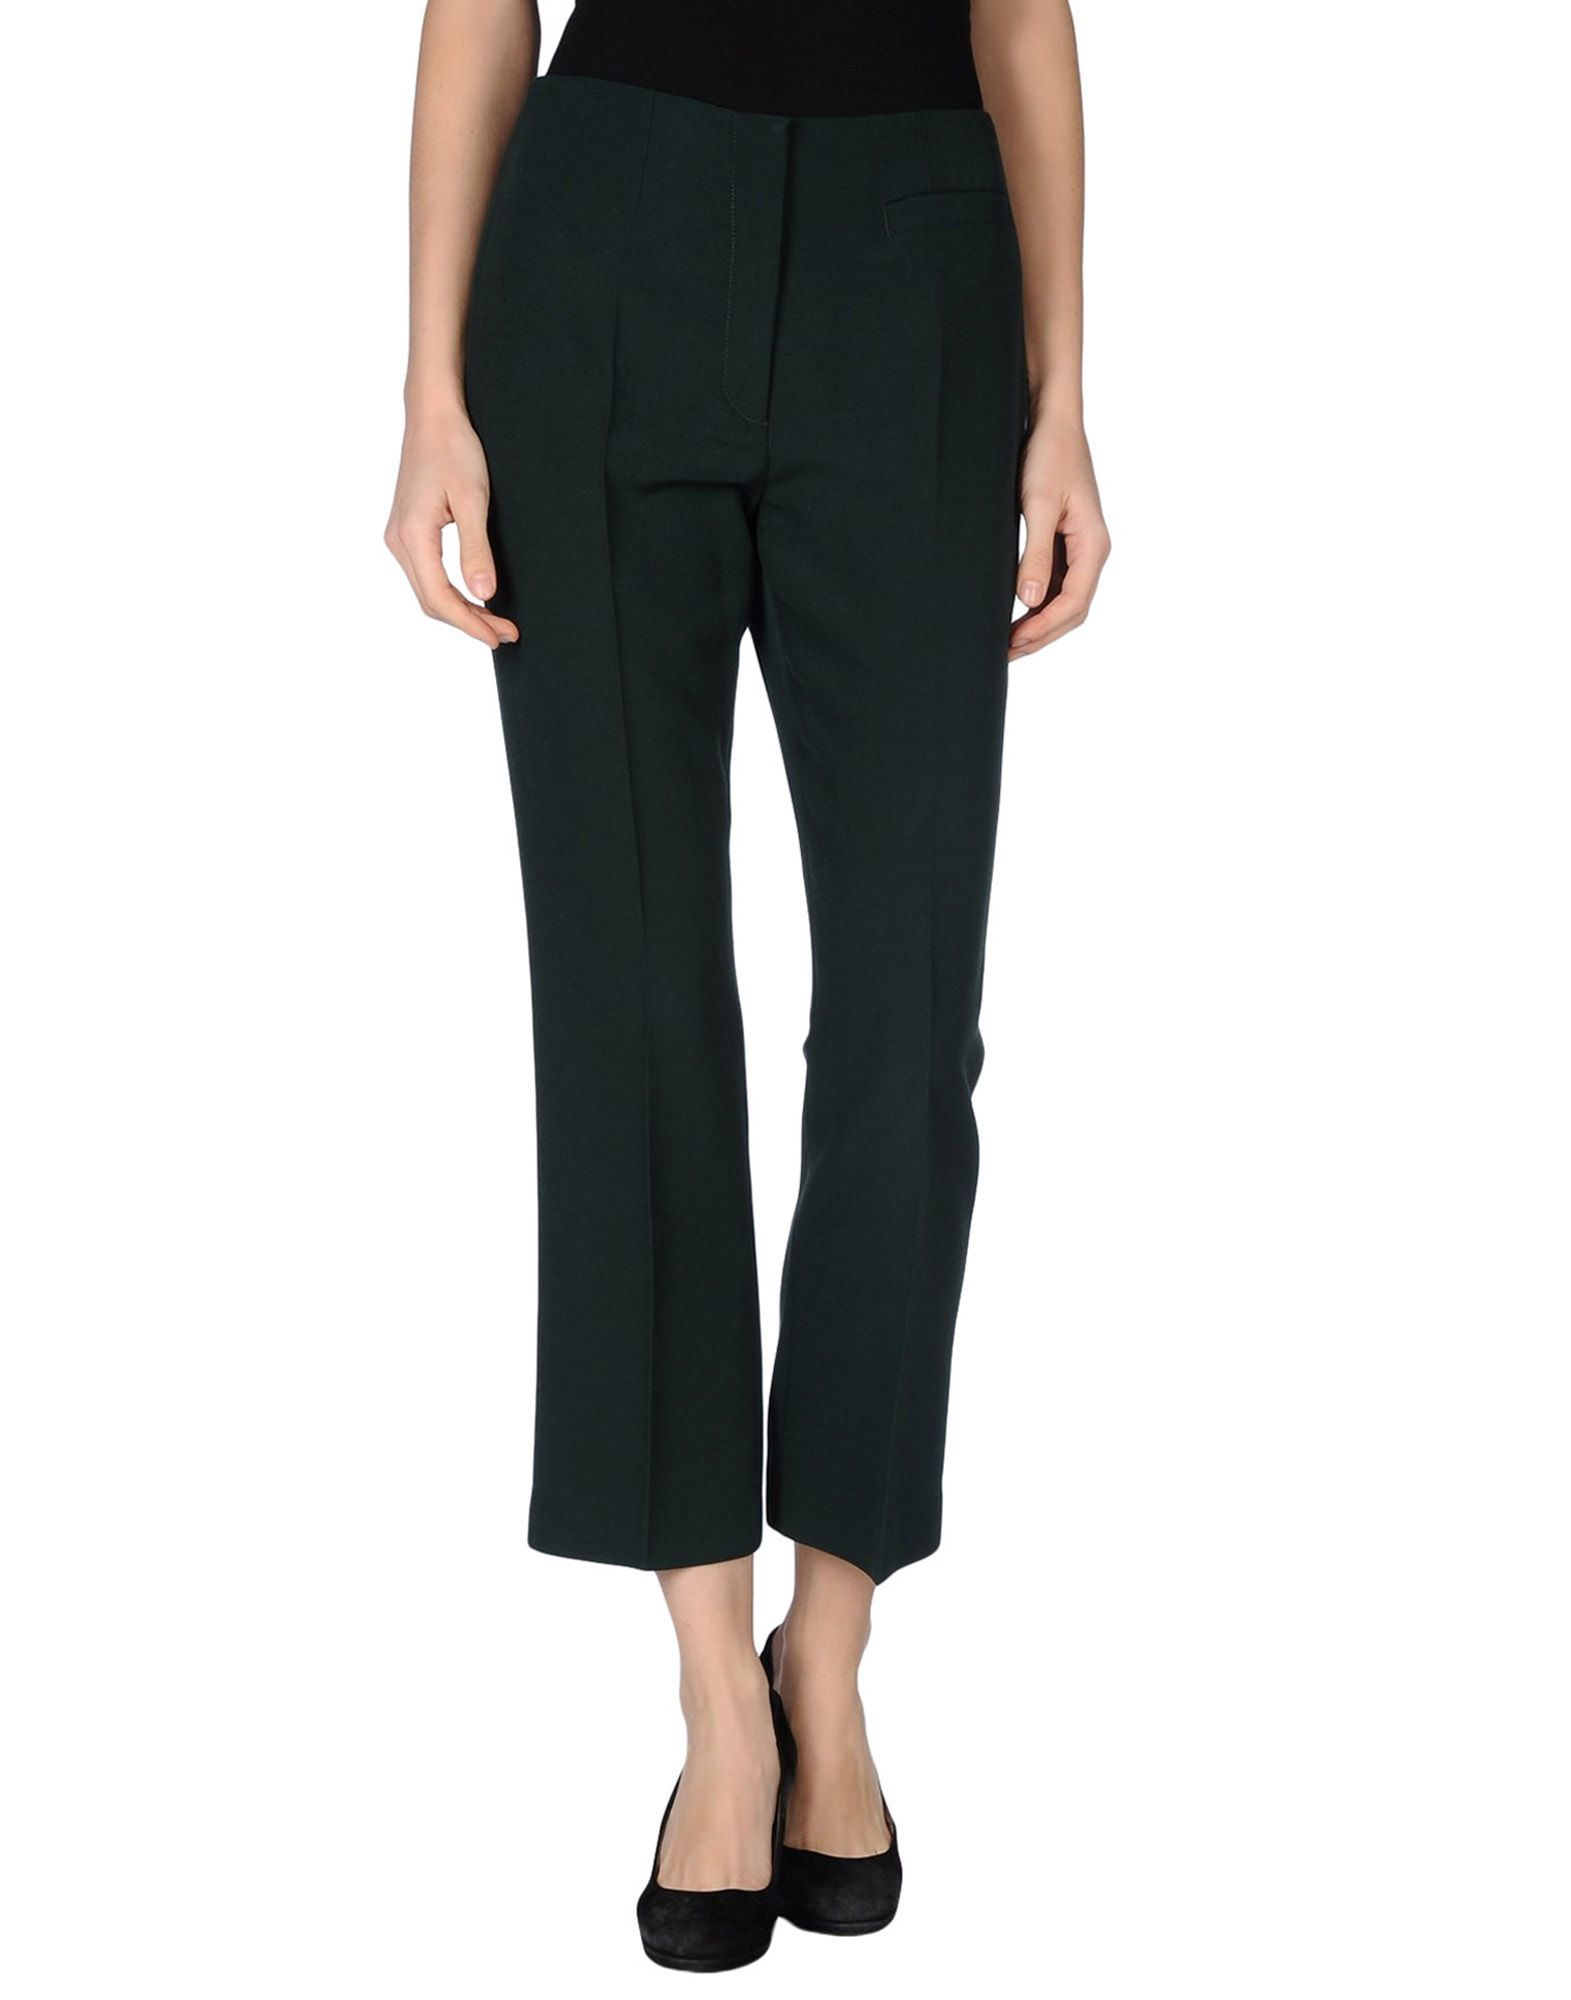 Pantalone Dondup Donna - Acquista online su 8x0oJw7LJ